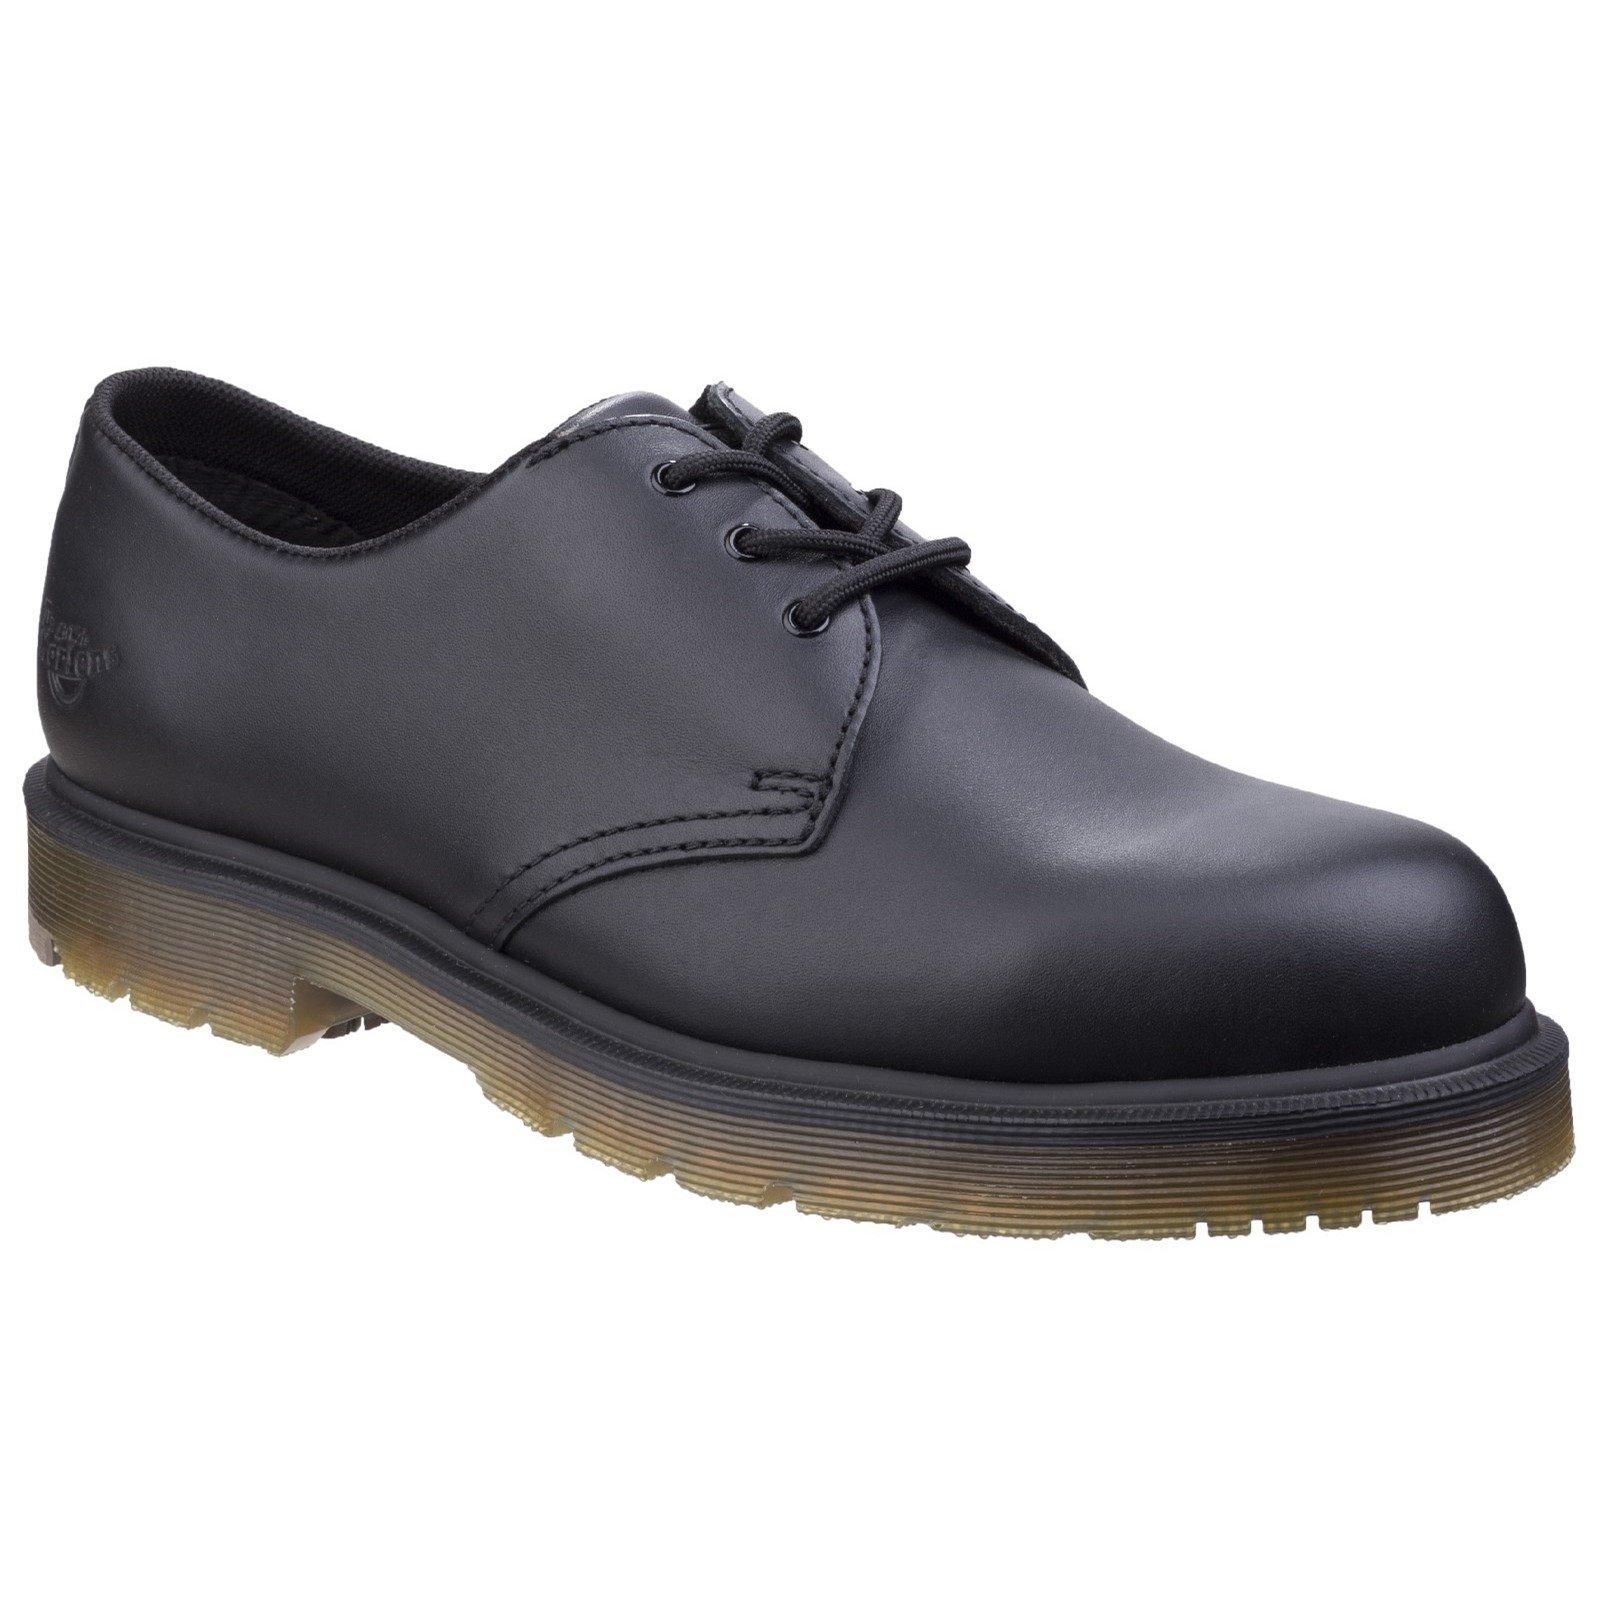 Dr Martens Men's Arlington NS Derby Shoe Black 26781 - Black Industrial Full Grain 13